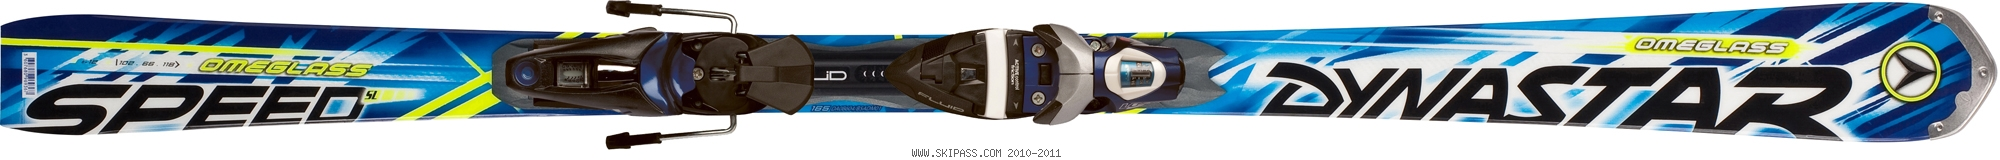 Dynastar Speed Omeglass